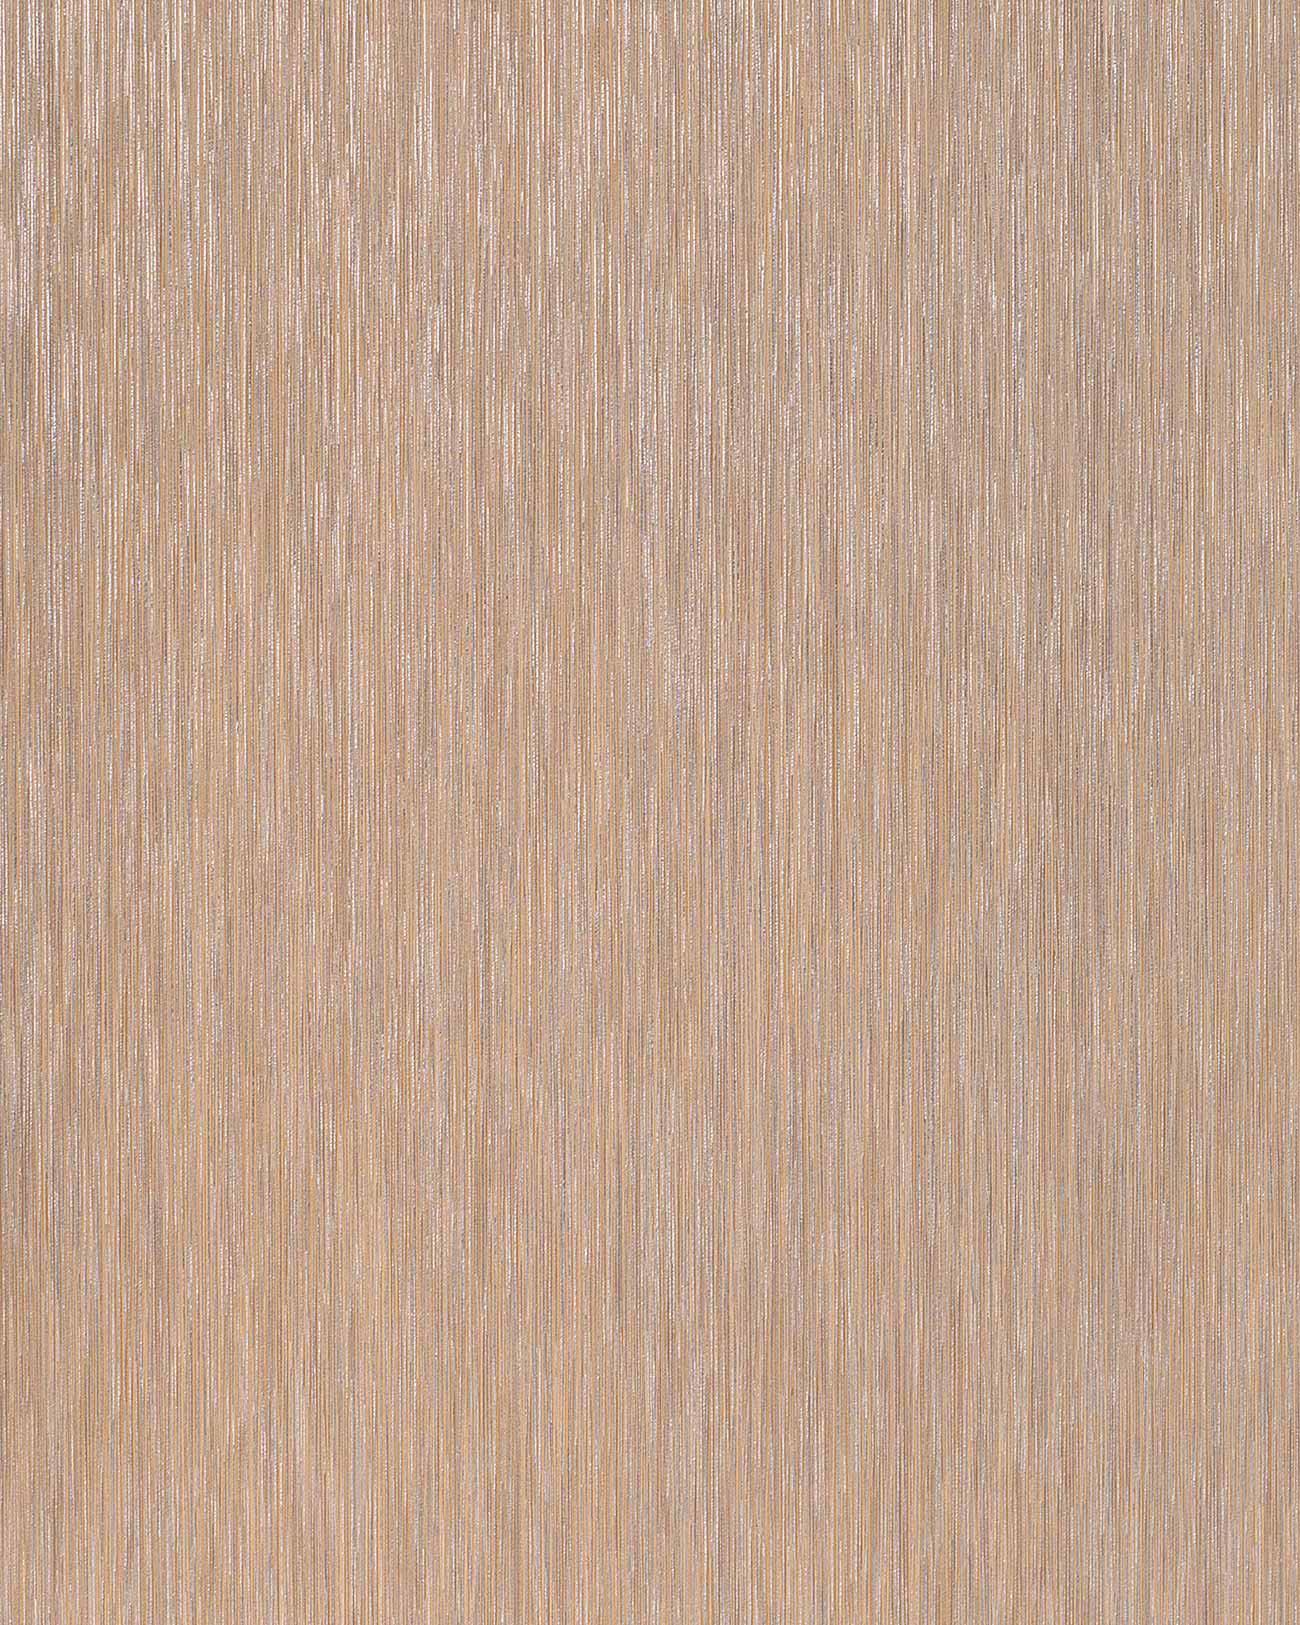 Streifen Tapete EDEM 1020-13 Designer Tapete Metallic Look ...